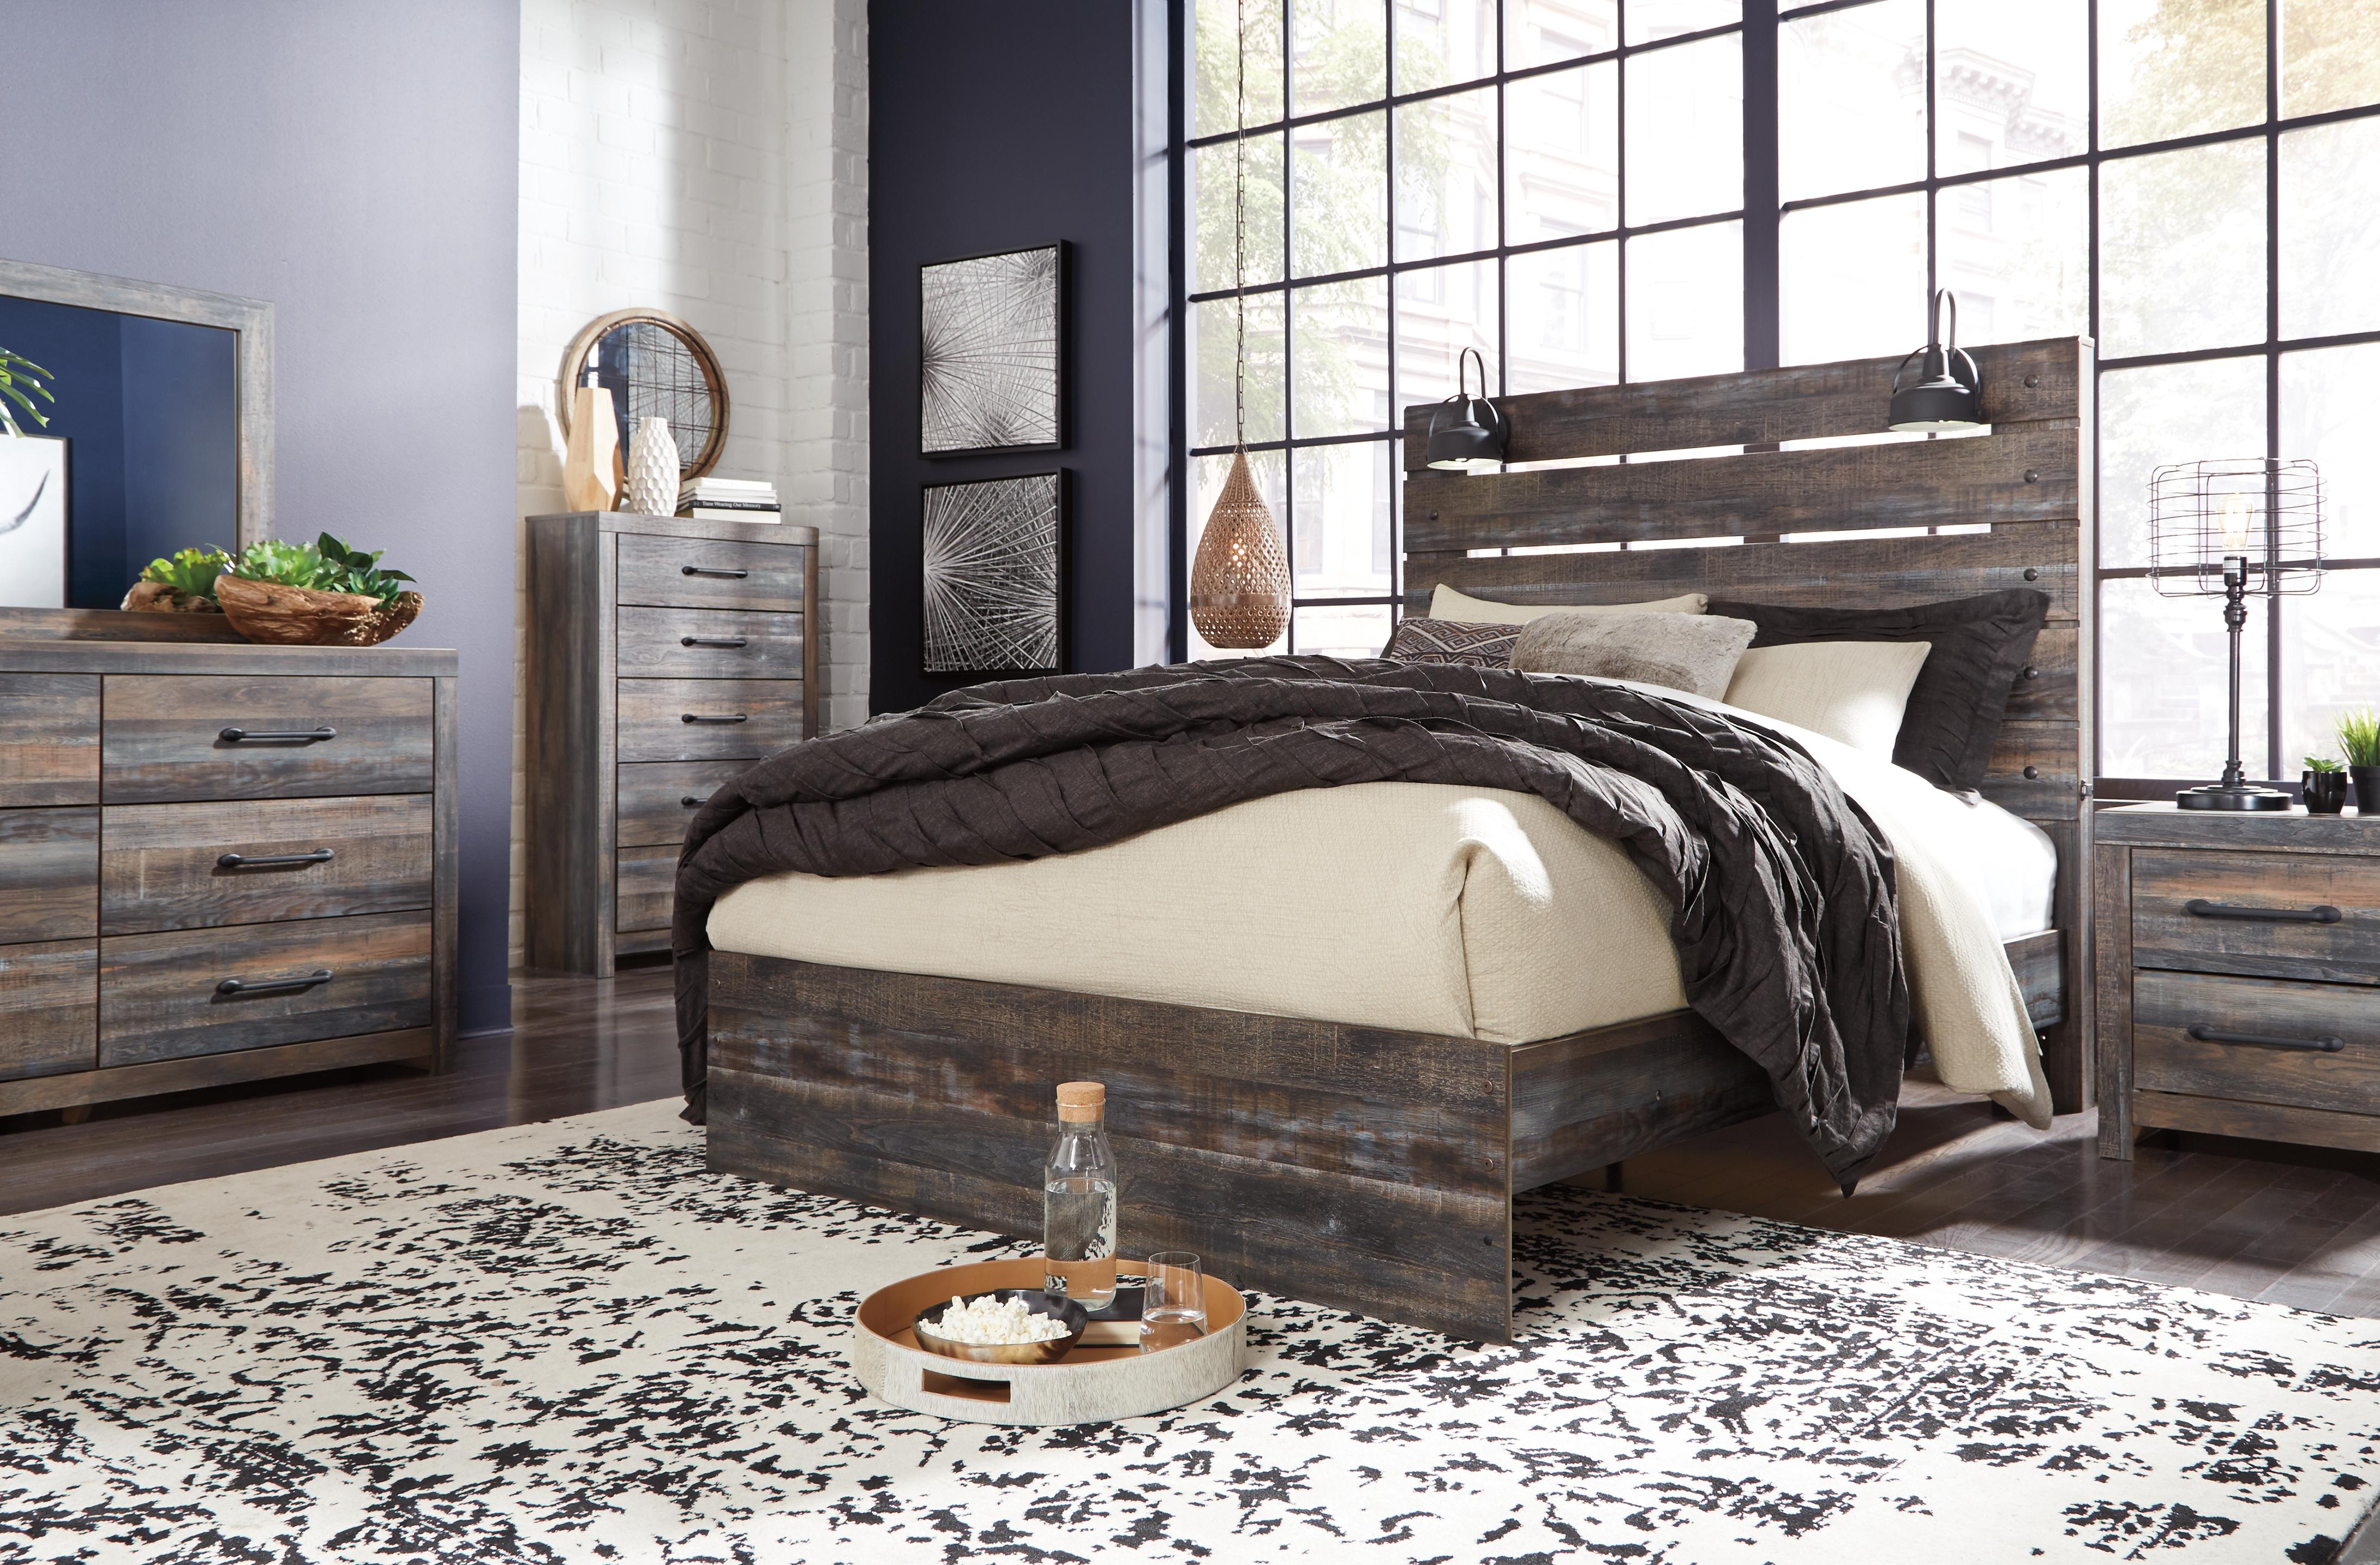 Drystan Queen Panel Headboard By Signature Design By Ashley B956534730 Godwin S Furniture Mattress